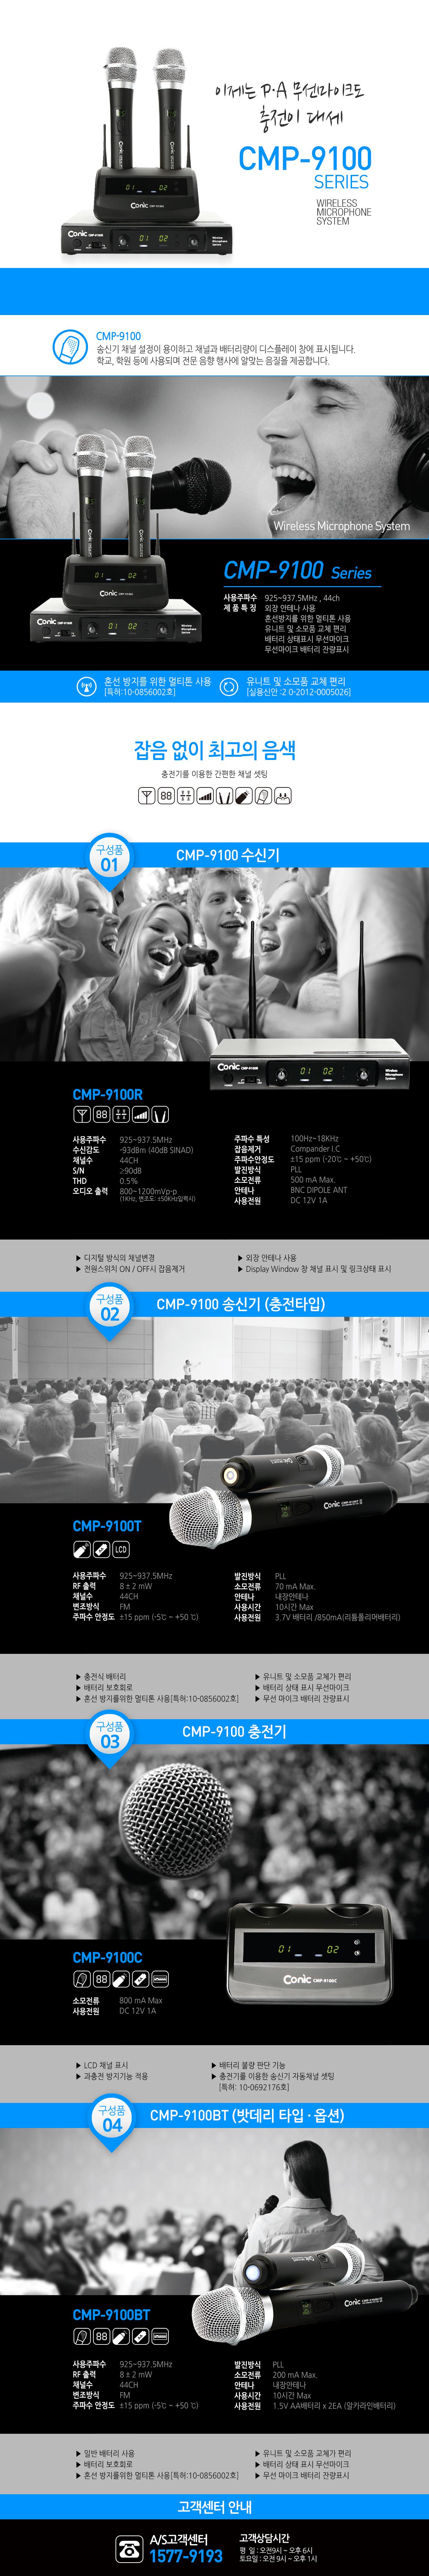 CMP-9100.jpg